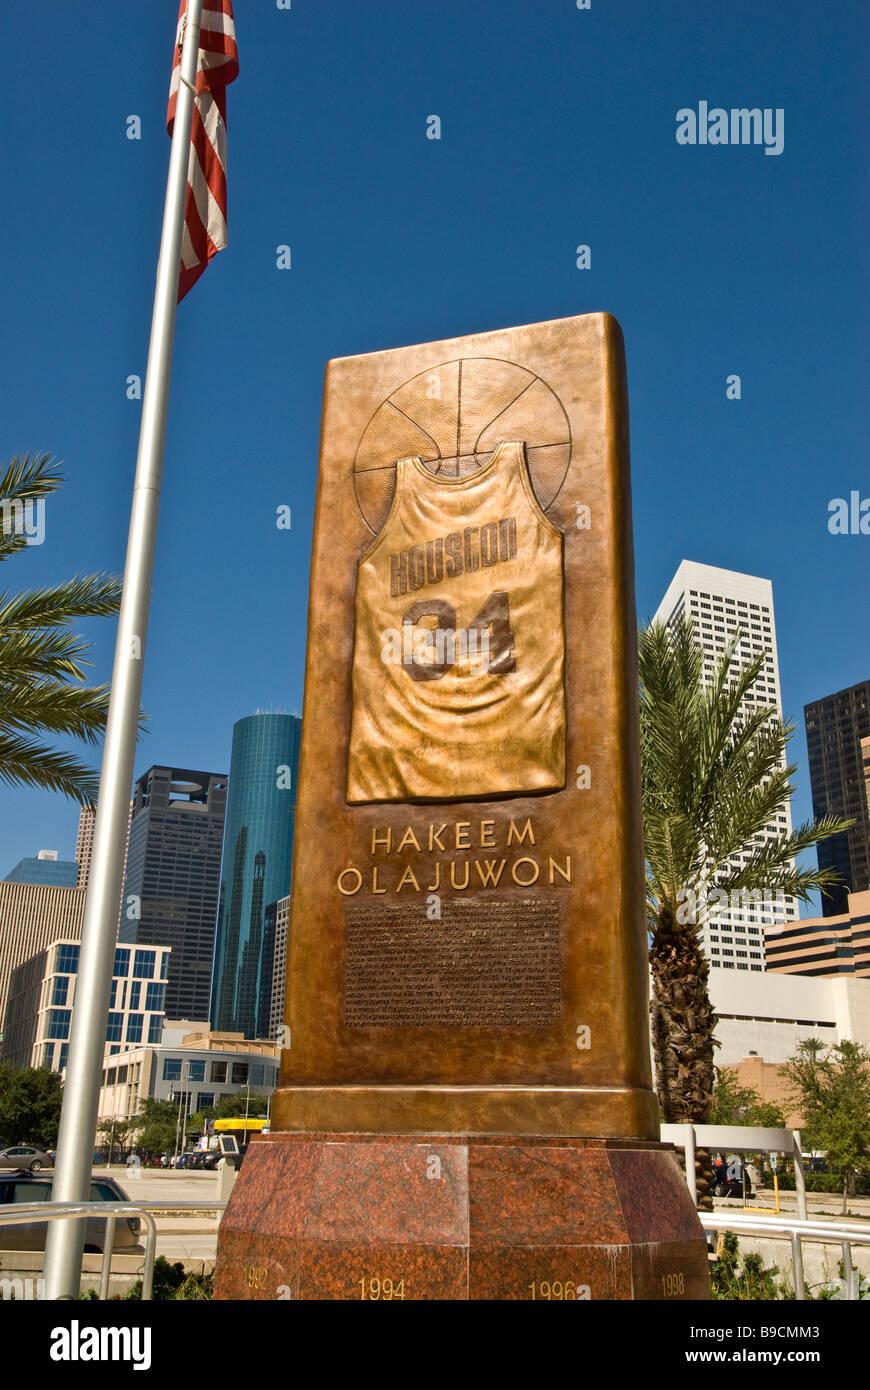 Hakeem Olajuwon Houston Texas astros NBA basketball player bronze monument with No. 34 jersey city landmark at Toyota - Stock Image